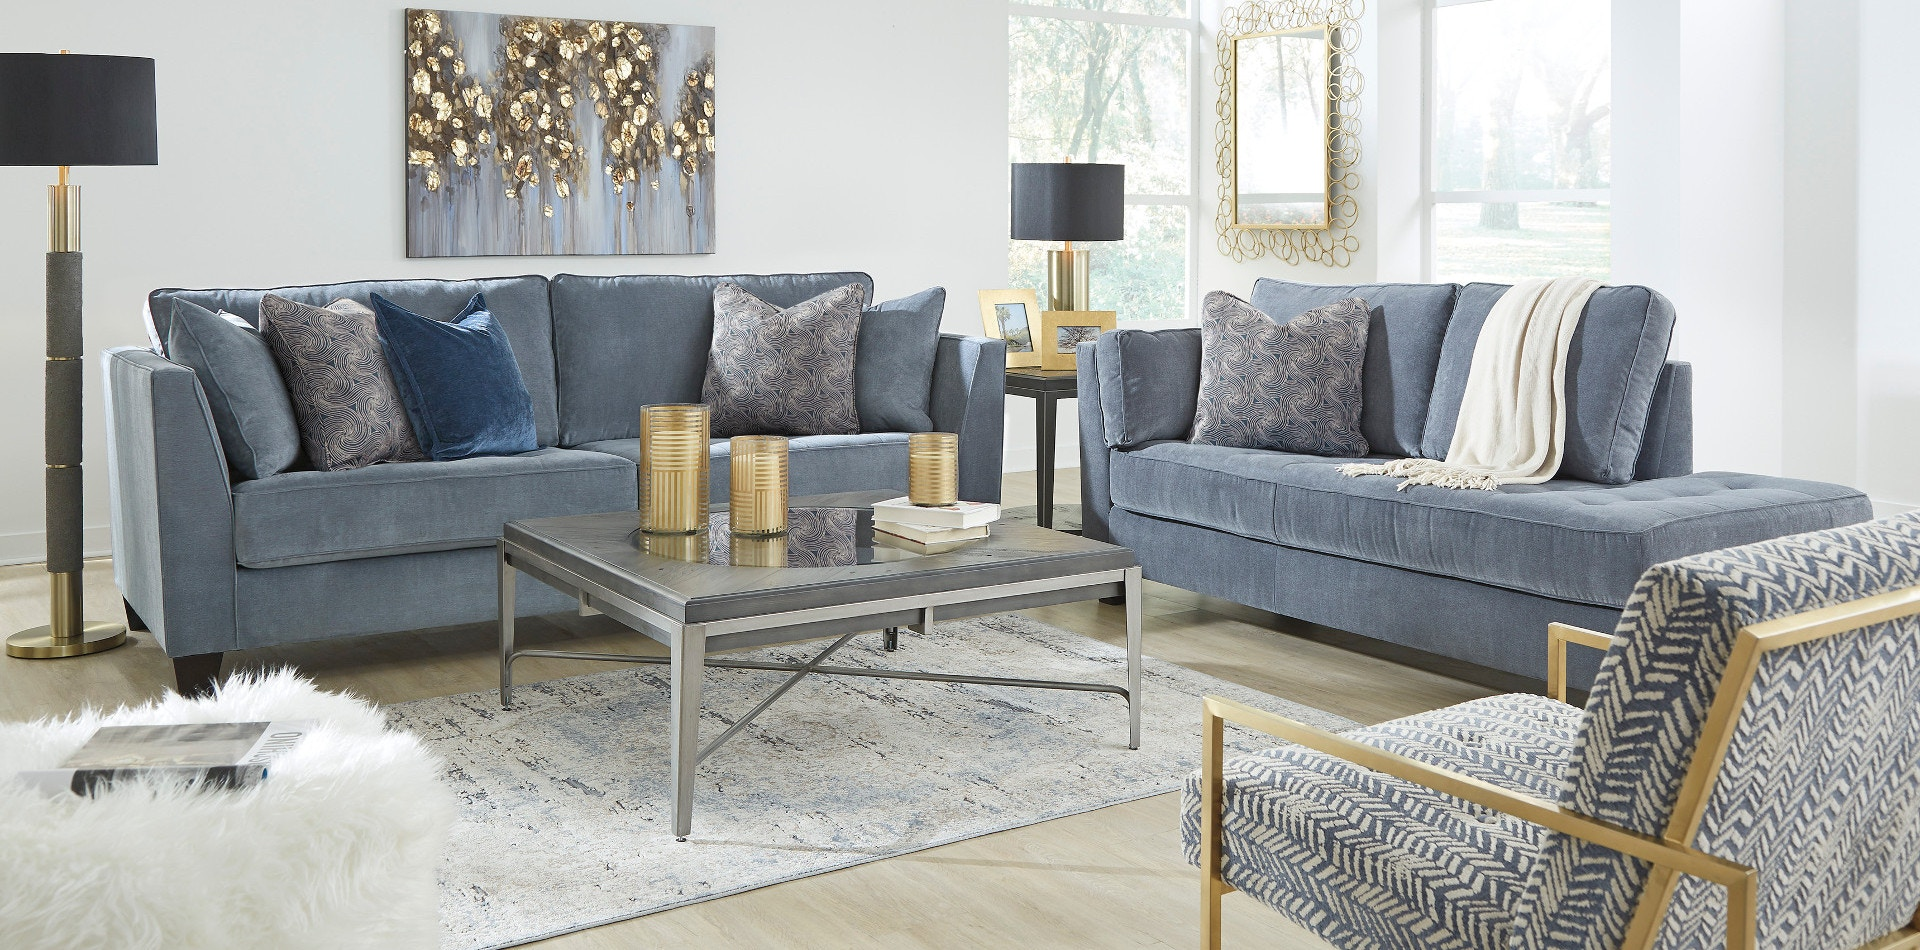 Lindsey S Furniture Northwest Florida S Best Bargains On The